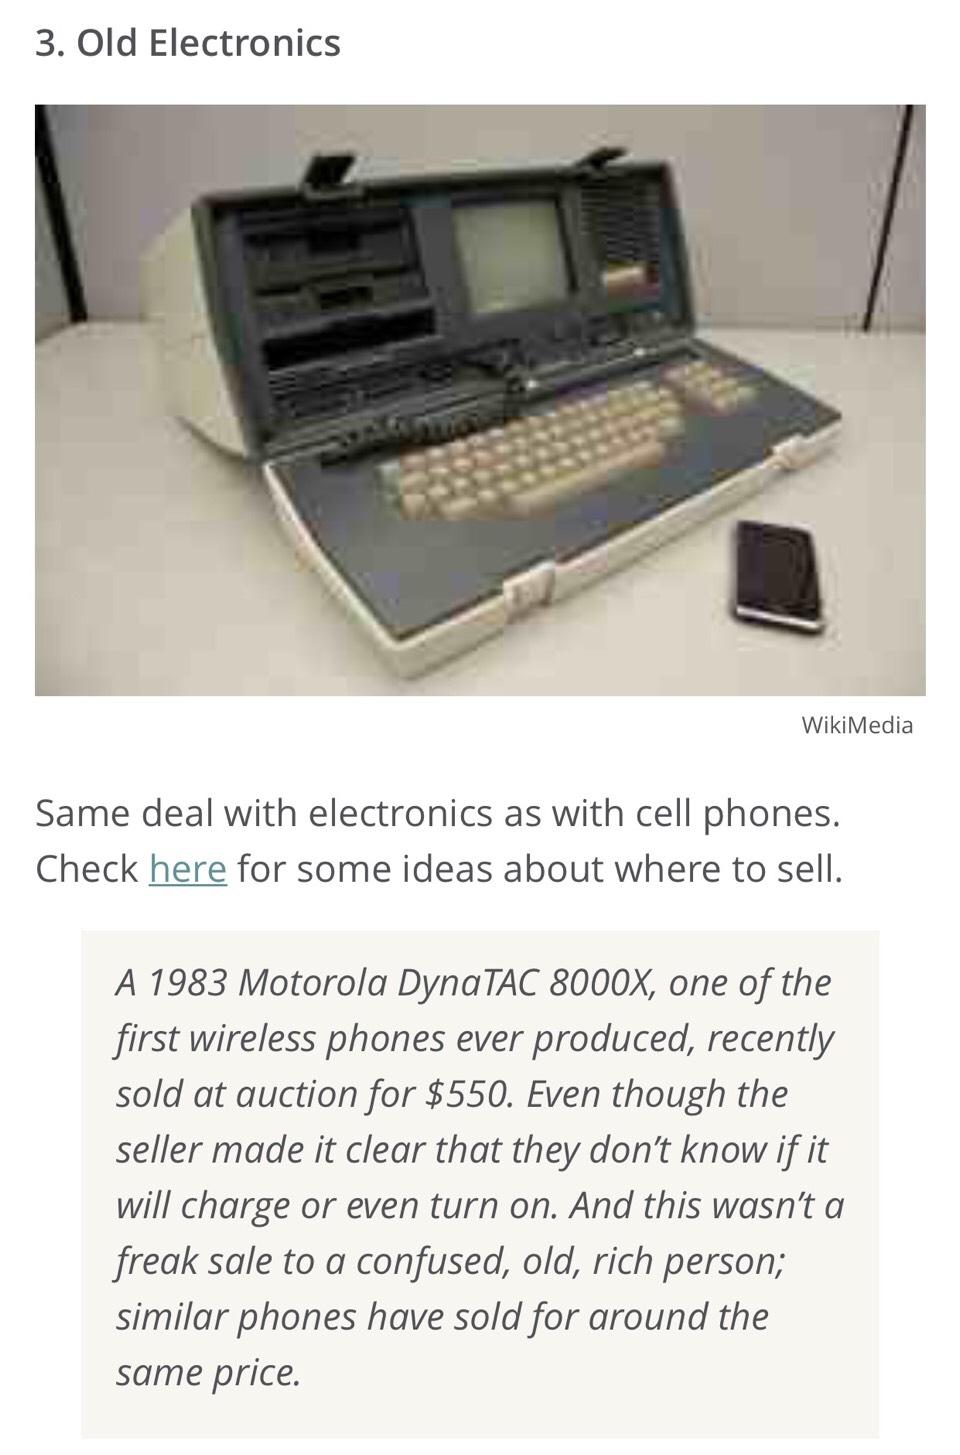 3. Old Electronics